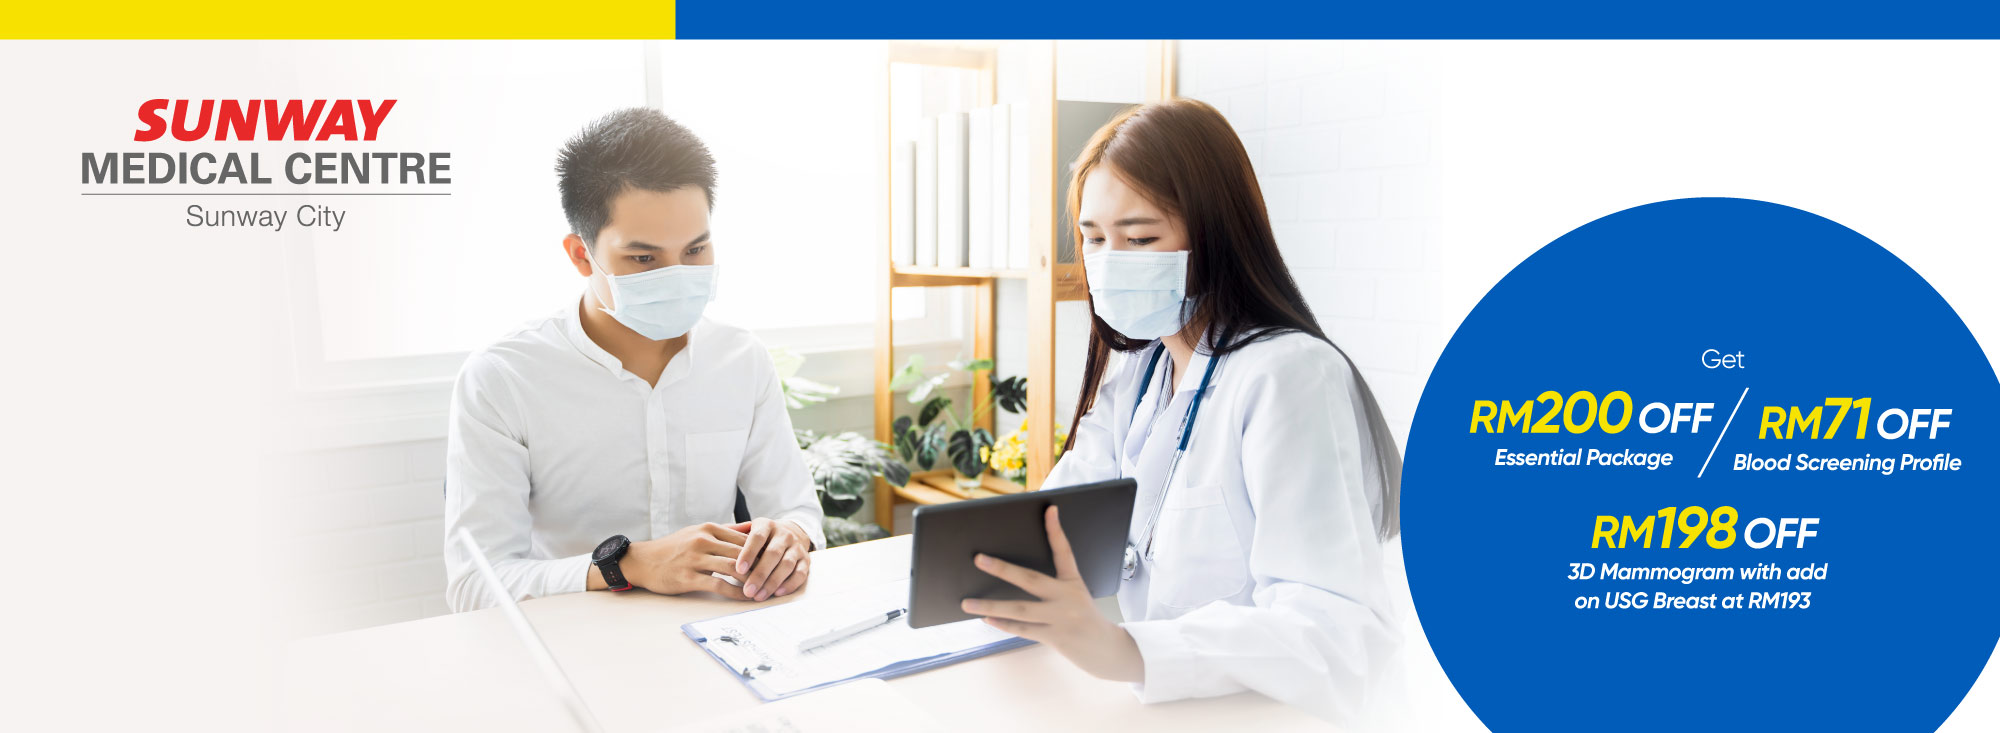 Sunway Medical Centre, Sunway City